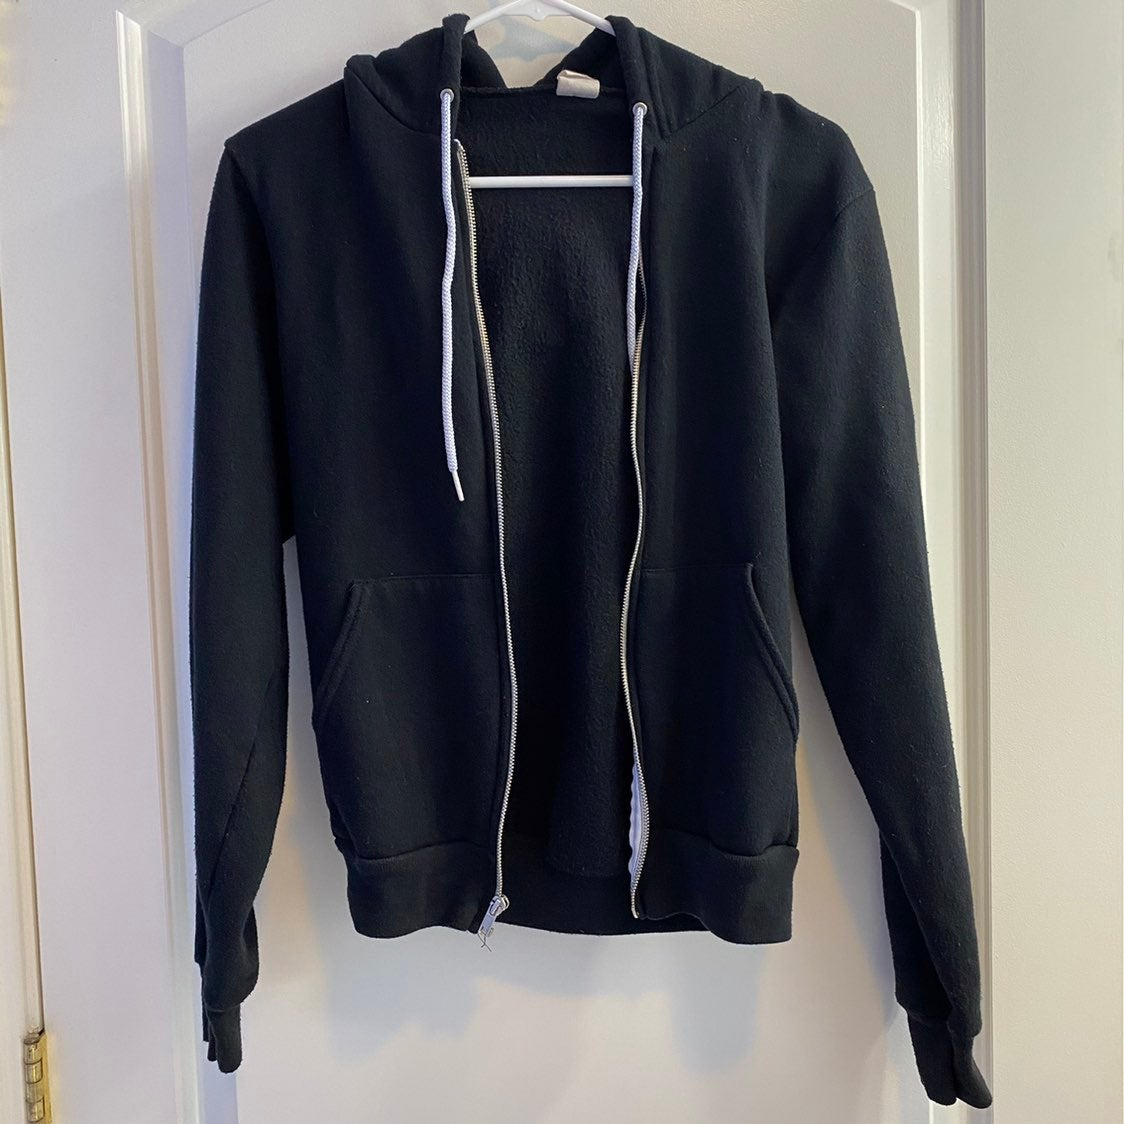 American Apparel Black Zip Up Jacket